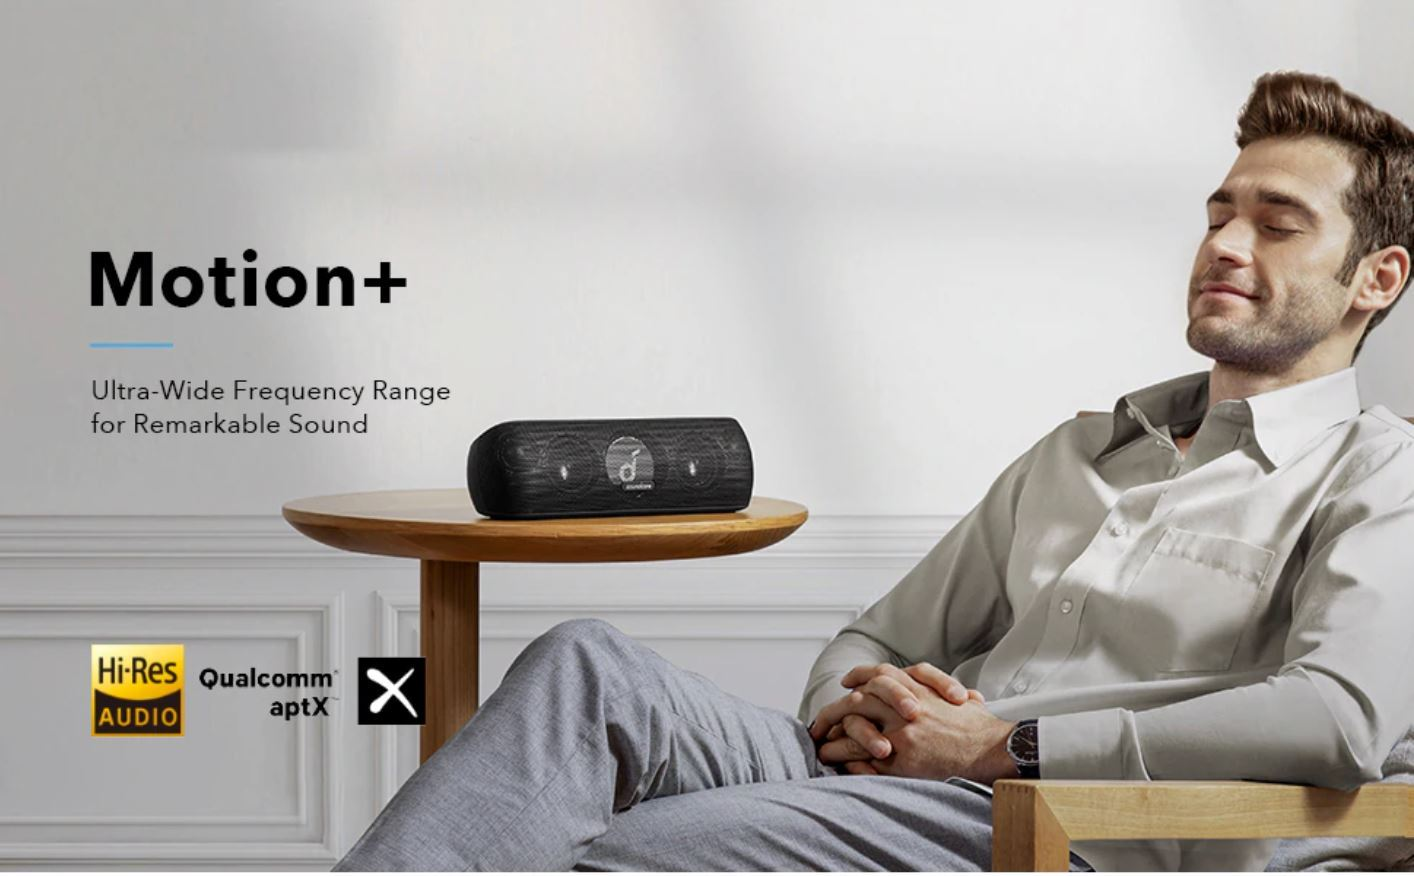 Święto marki Anker na Aliexpress - Anker Soundcore Motion+ Bluetooth Speaker